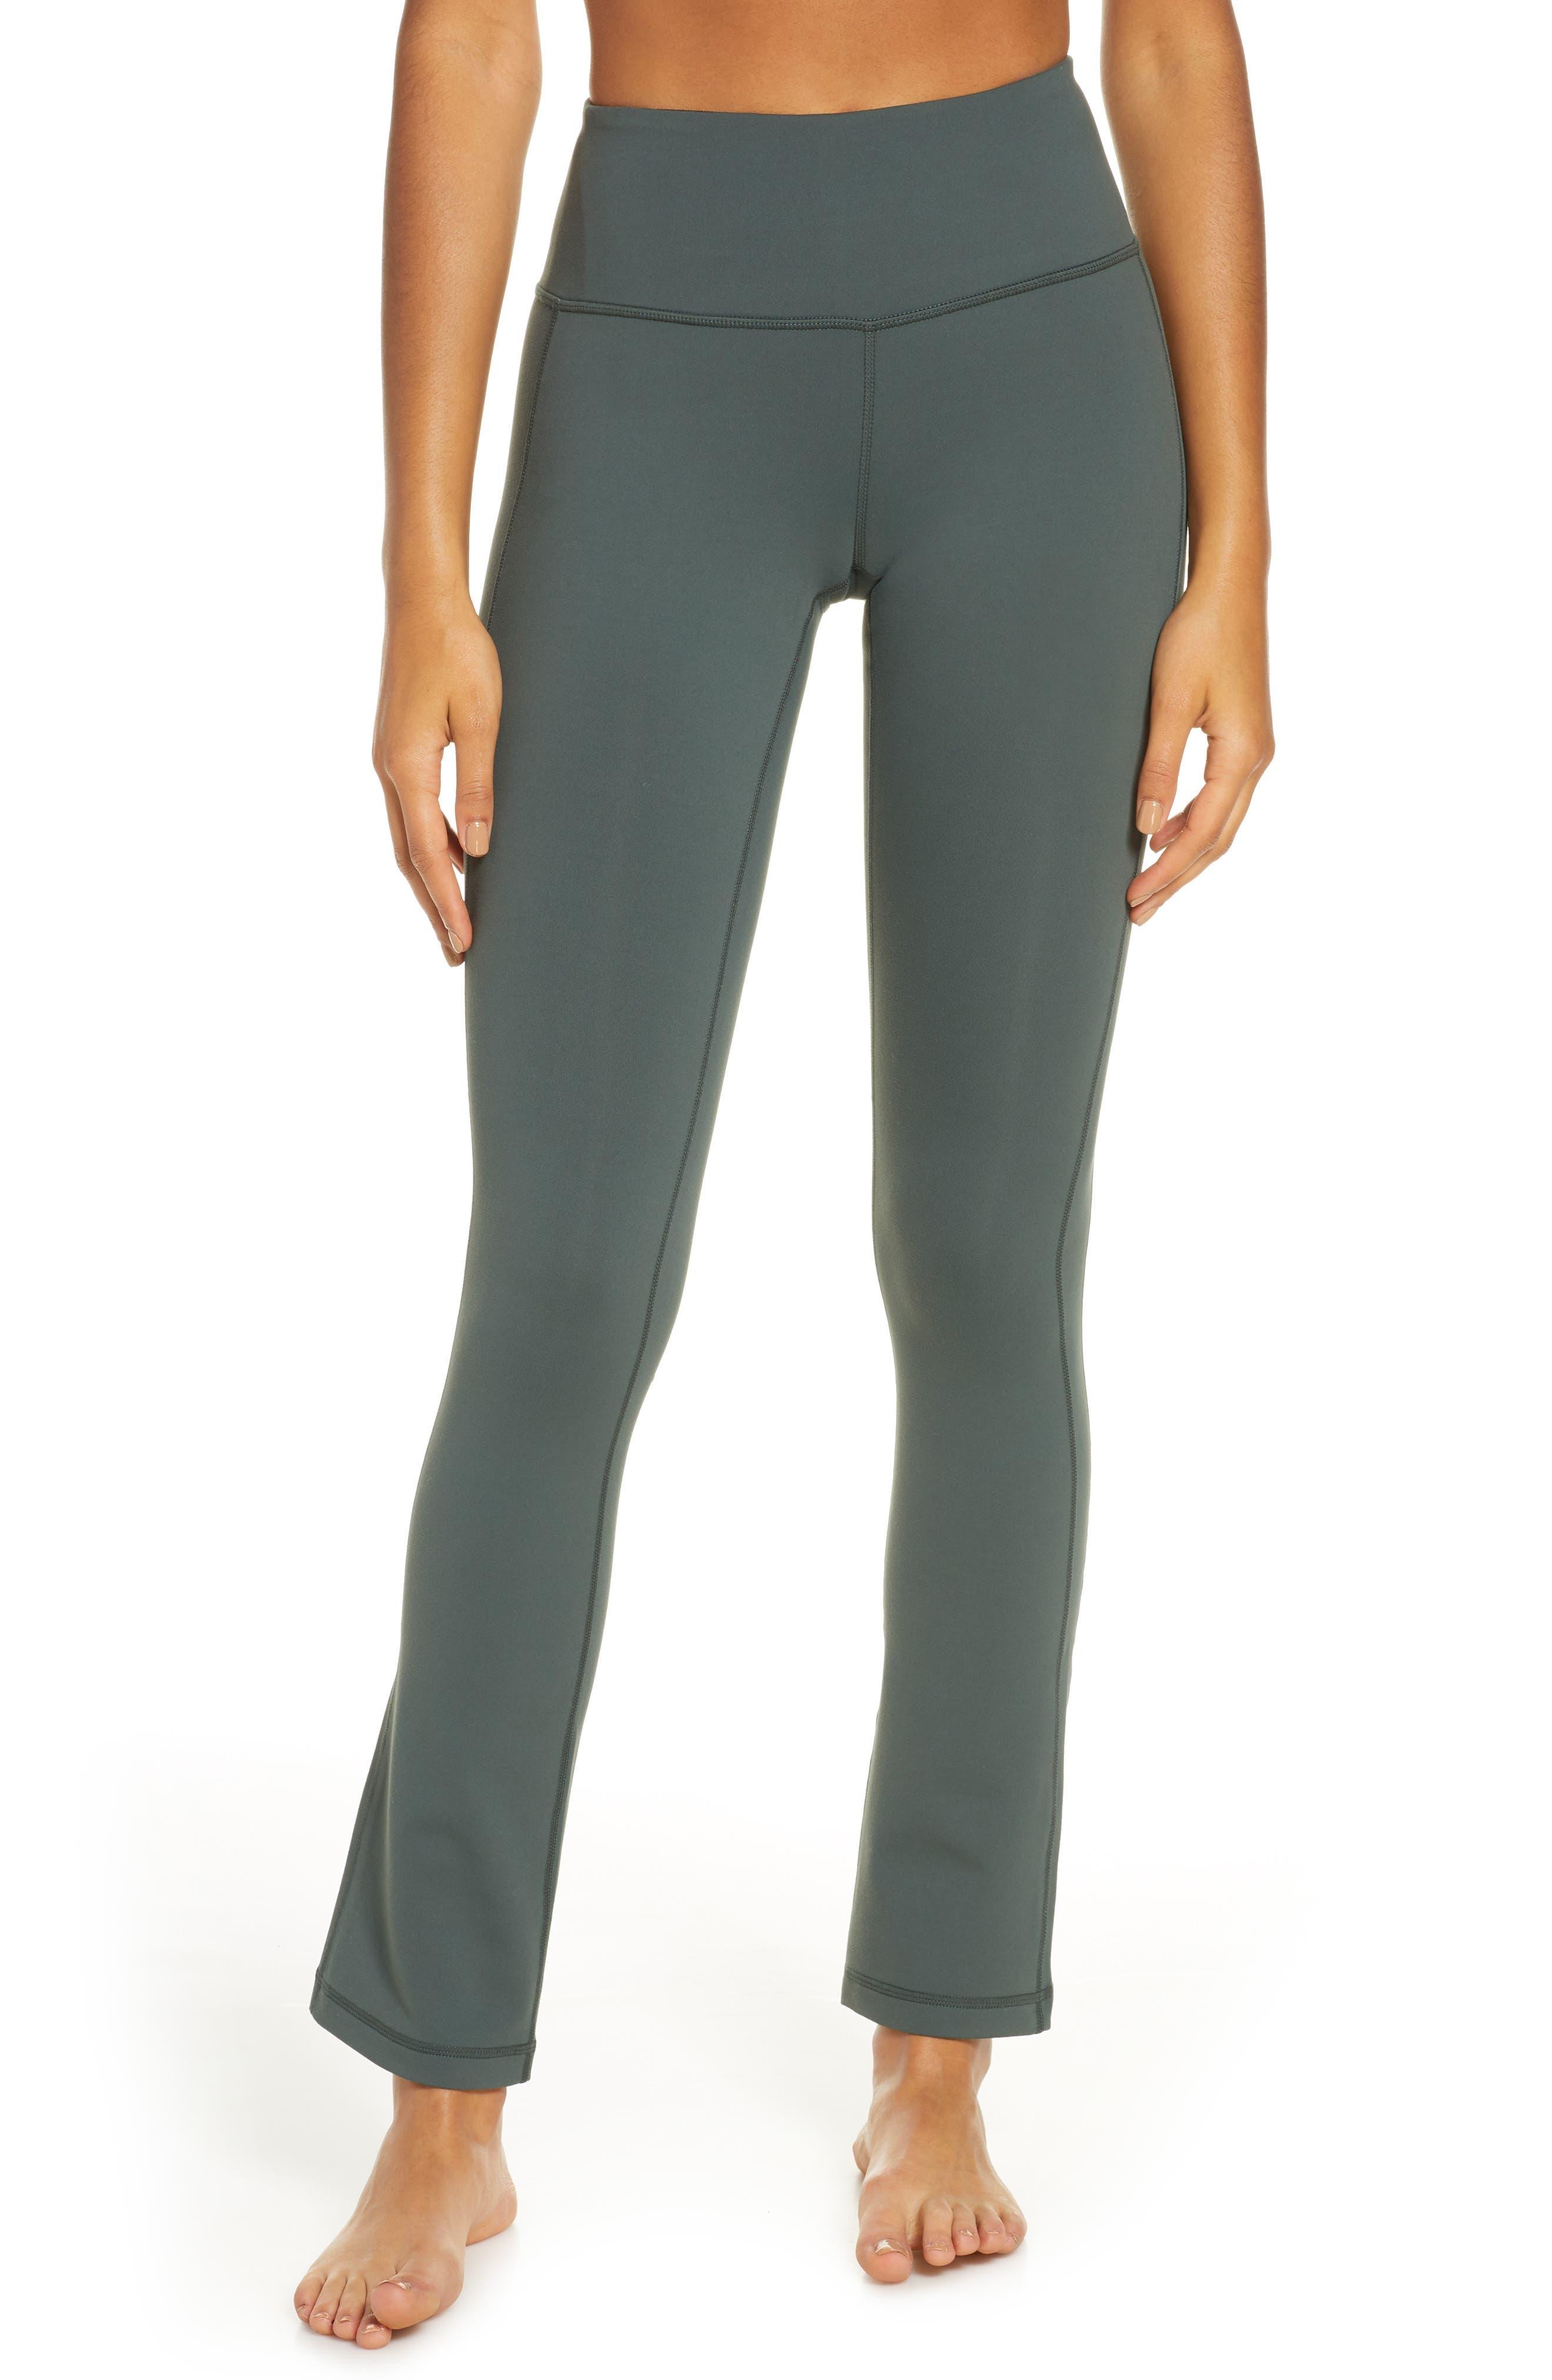 Zella Live in Plank Straight Leg Yoga Pants